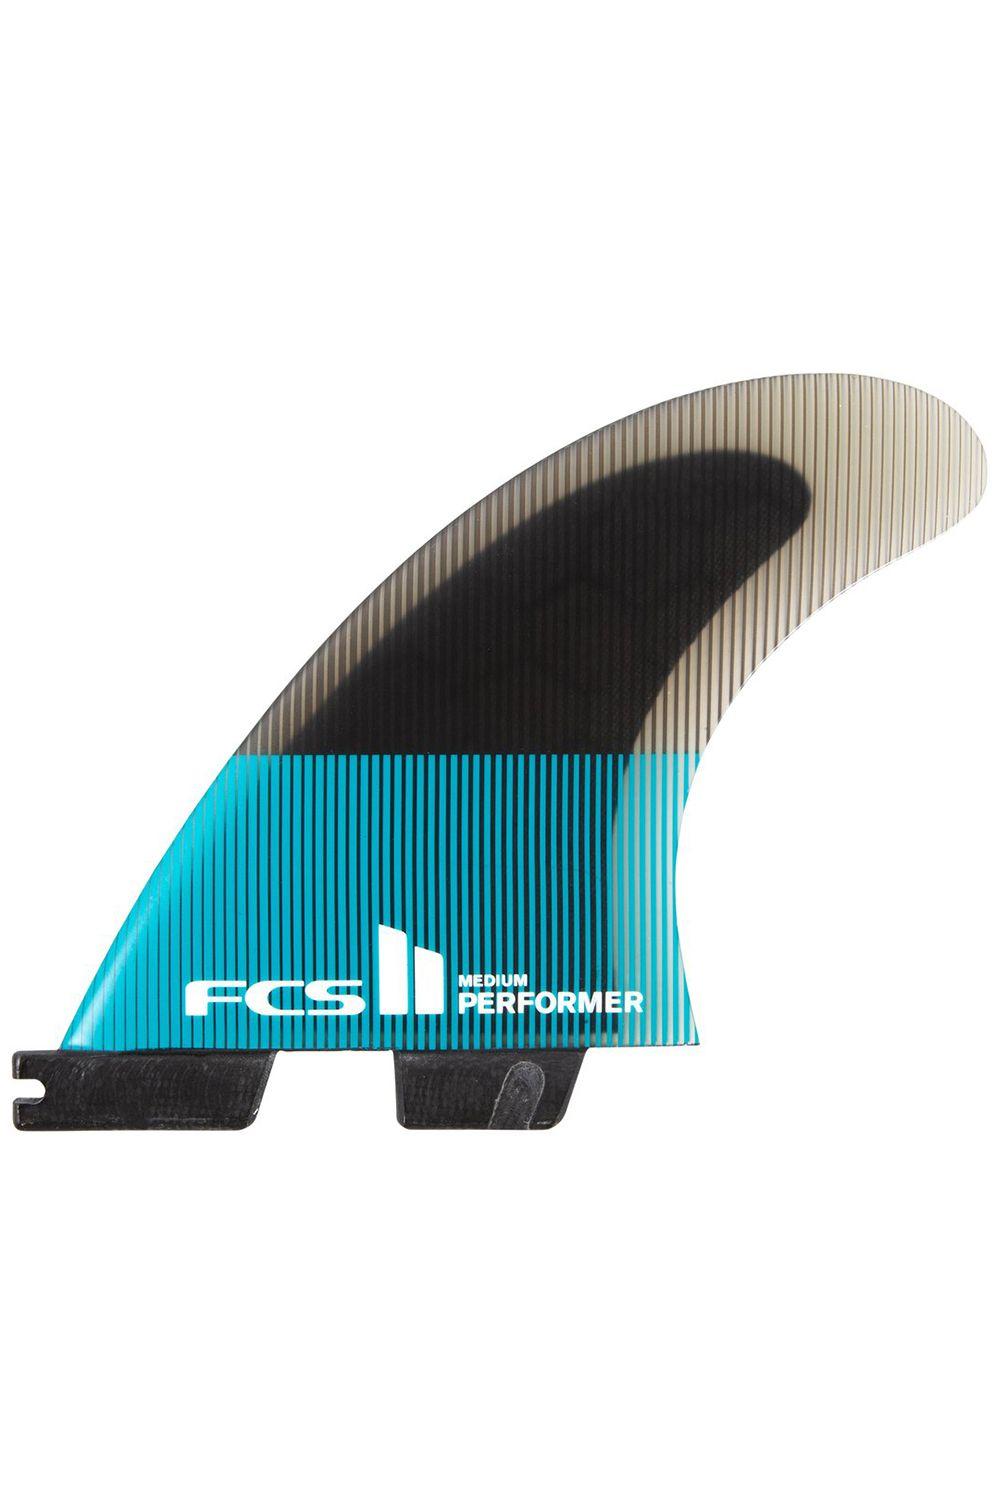 Fcs Fins II PERFORMER PC XLARGE TEAL/BLACK TRI Tri FCS II XL